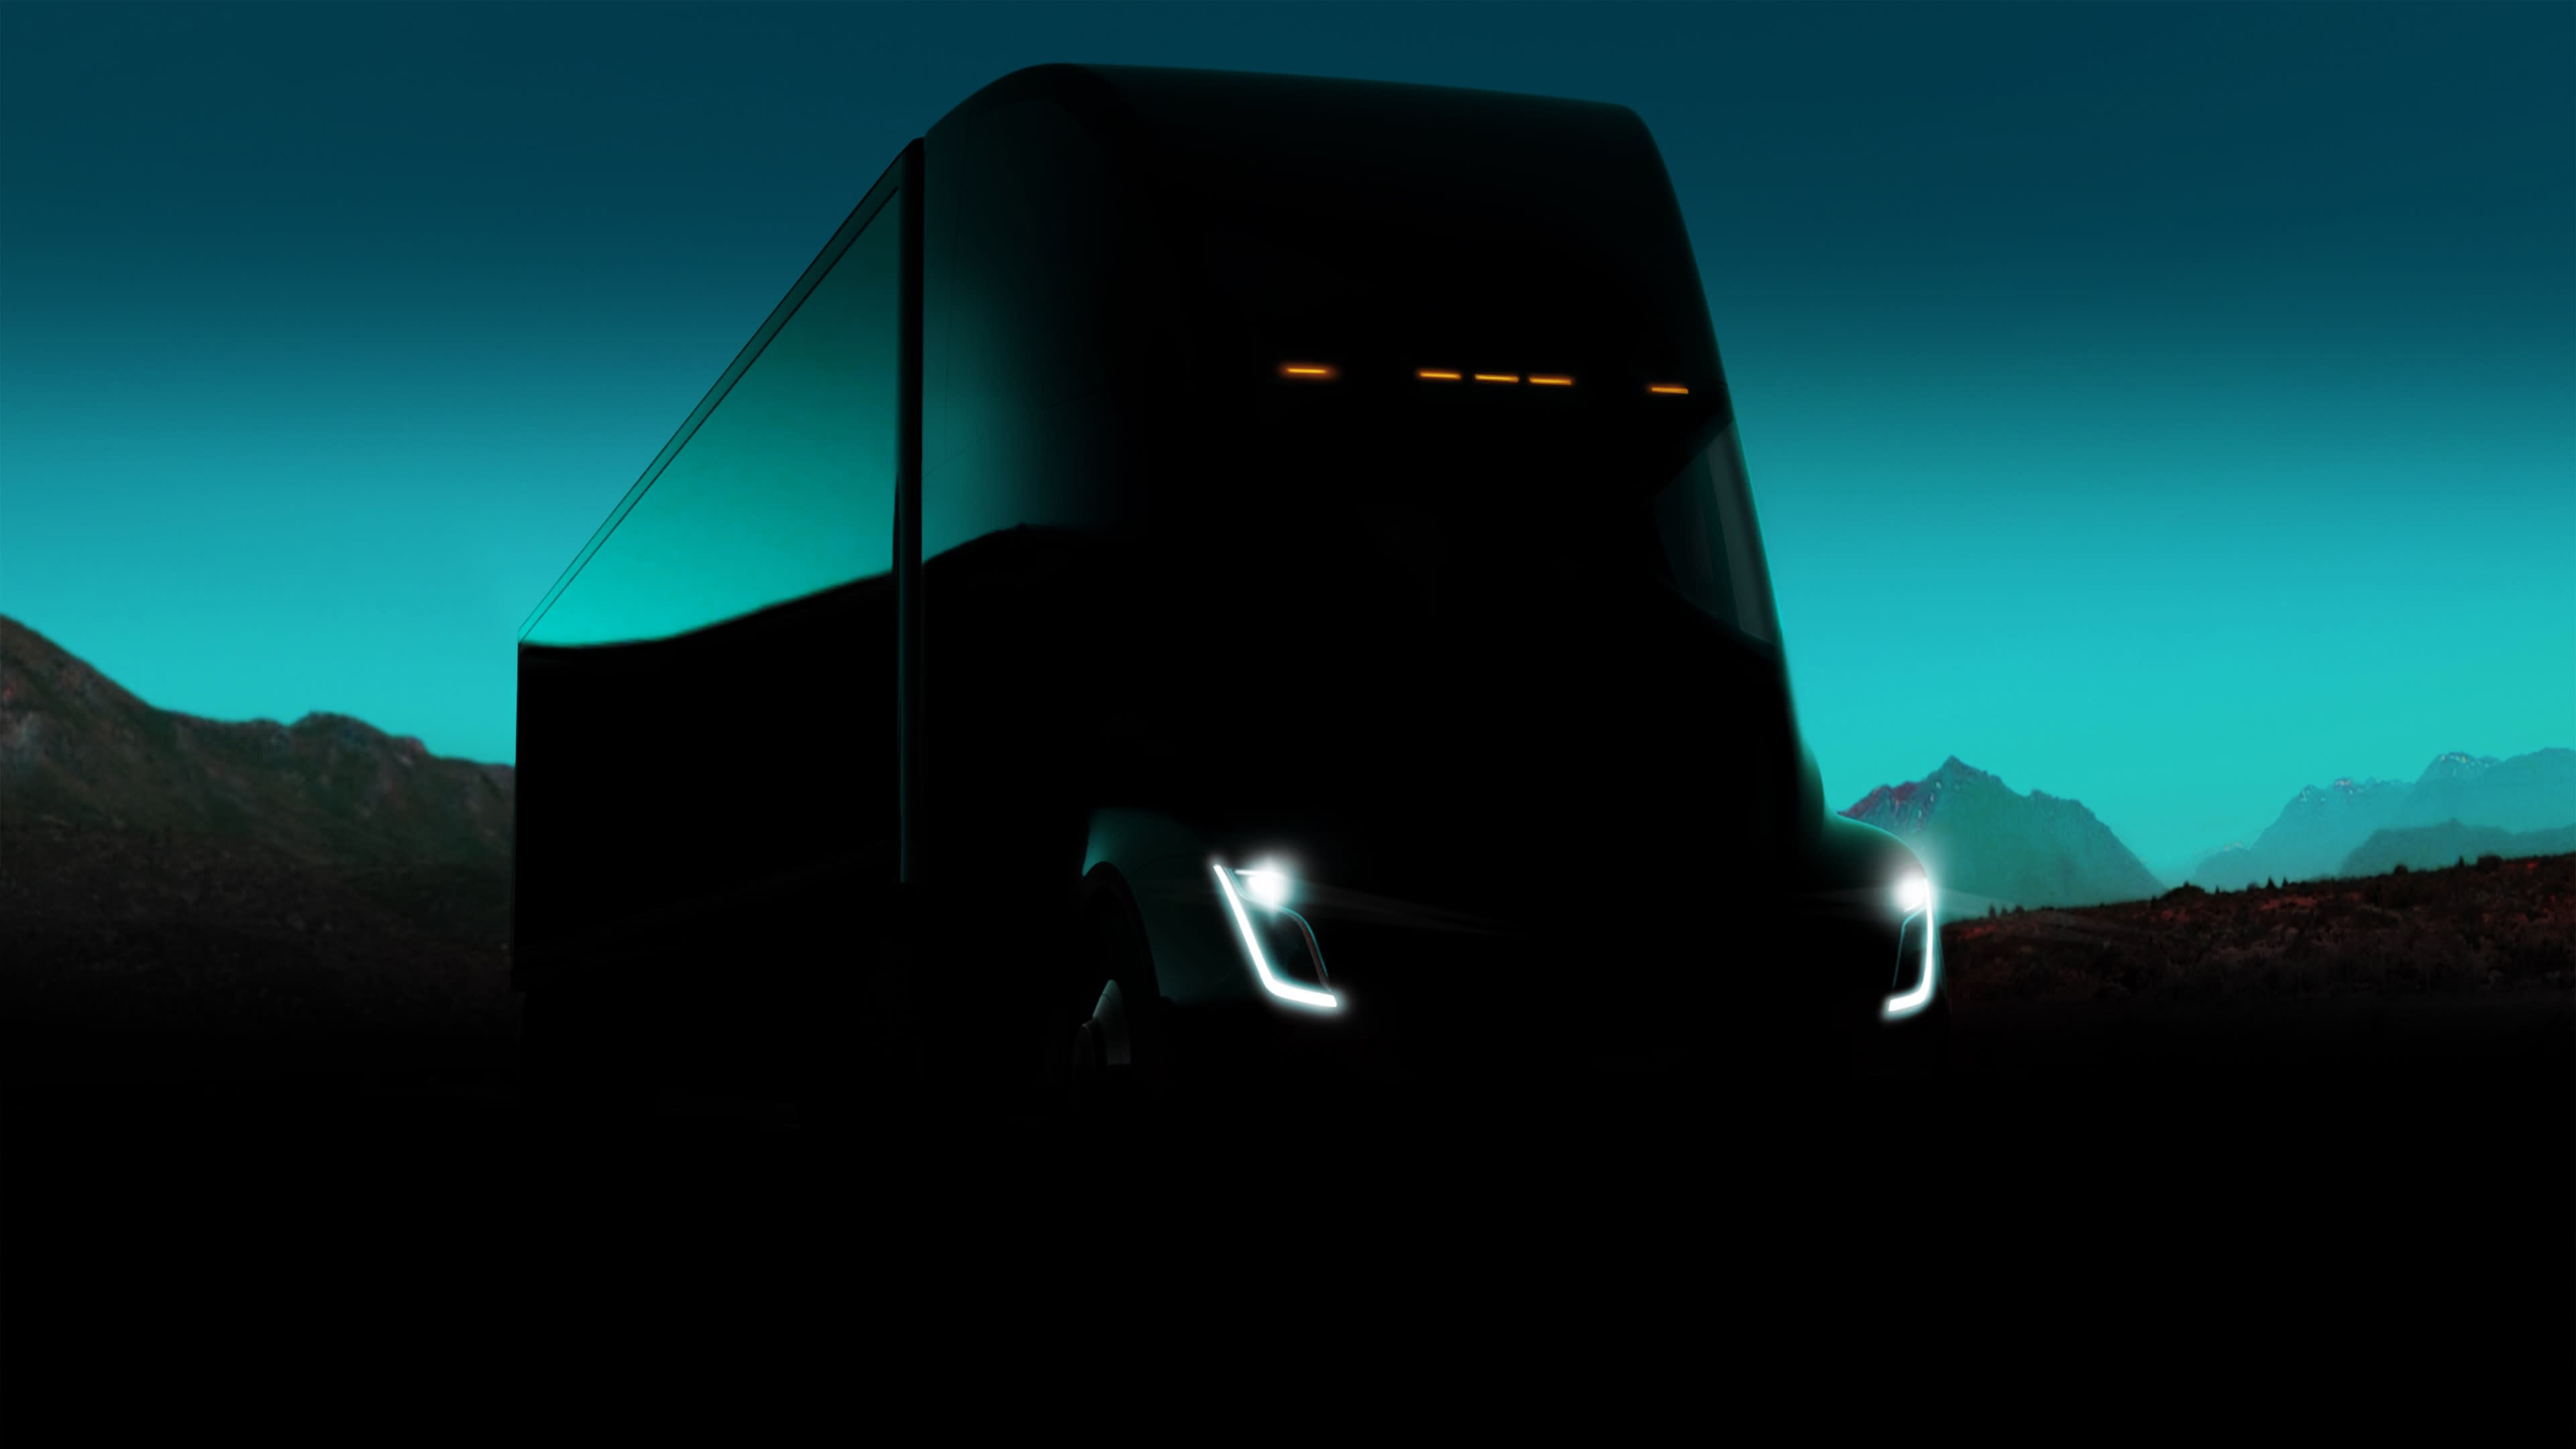 electric-truck elon-musk semi-truck tesla tesla-semi-truck